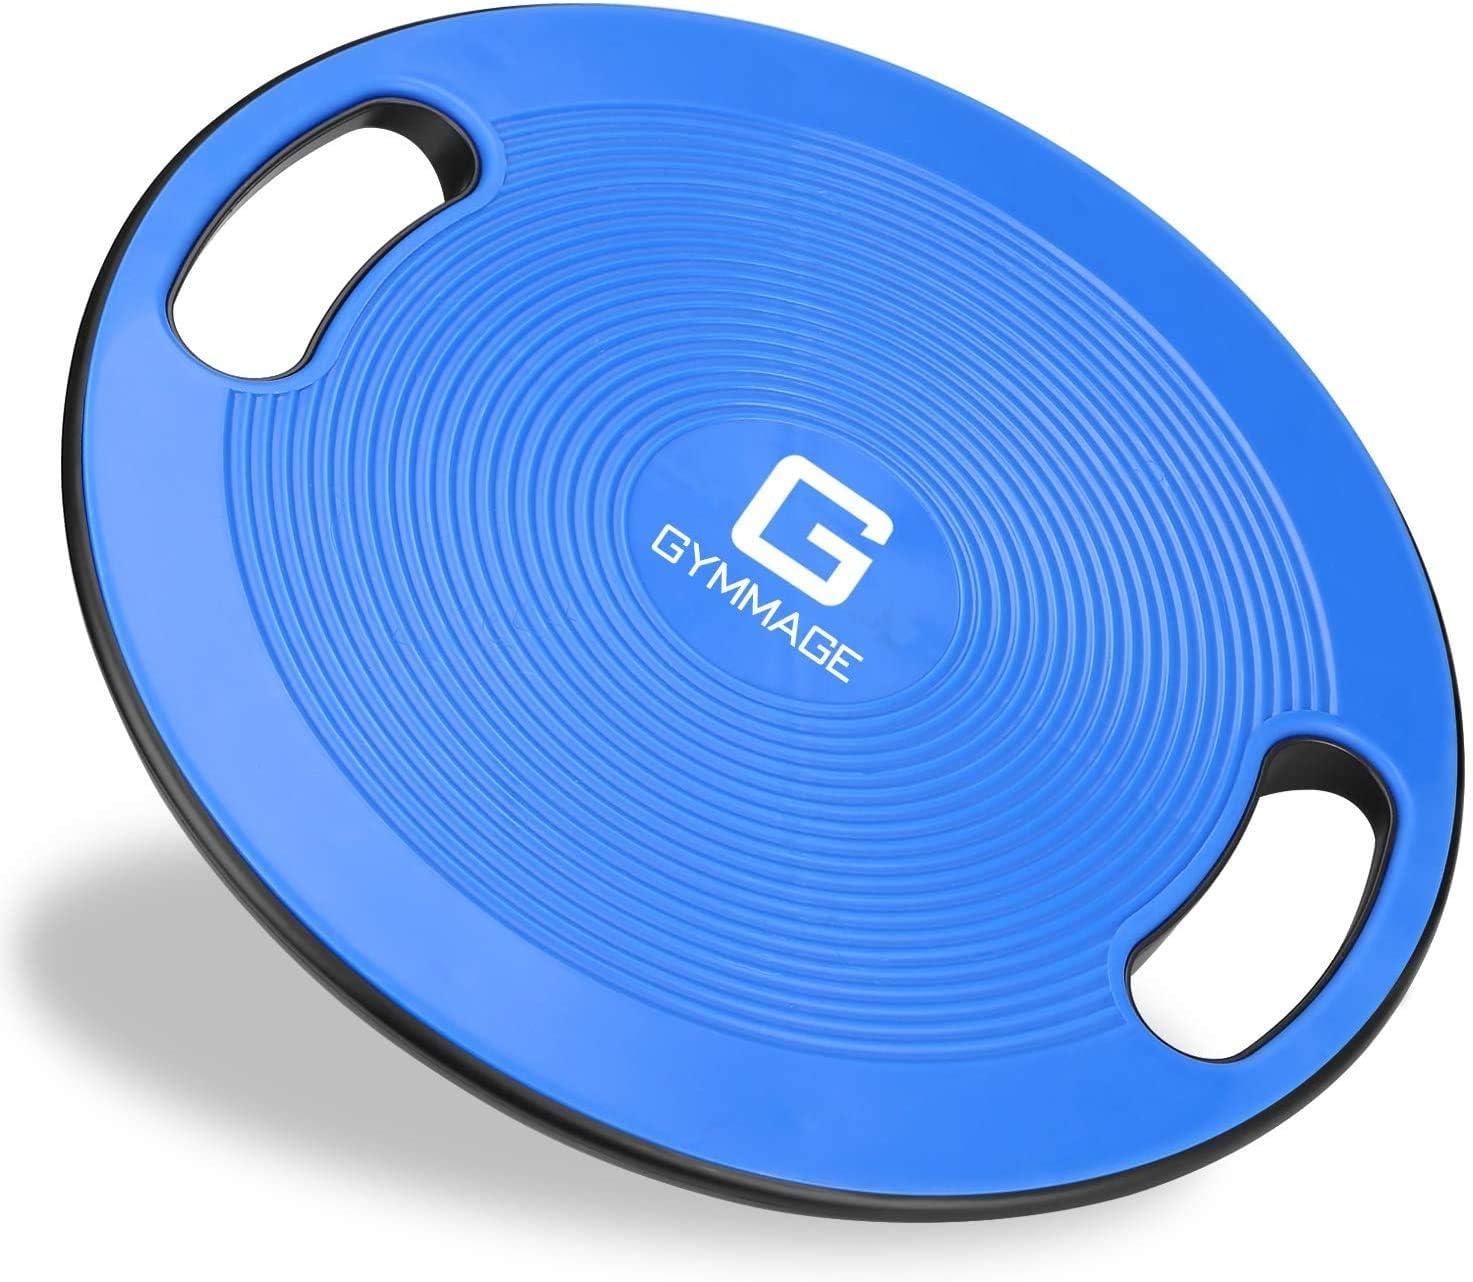 GYMMAGE Wobble Balance Board - Exercise Balance Stability Traine